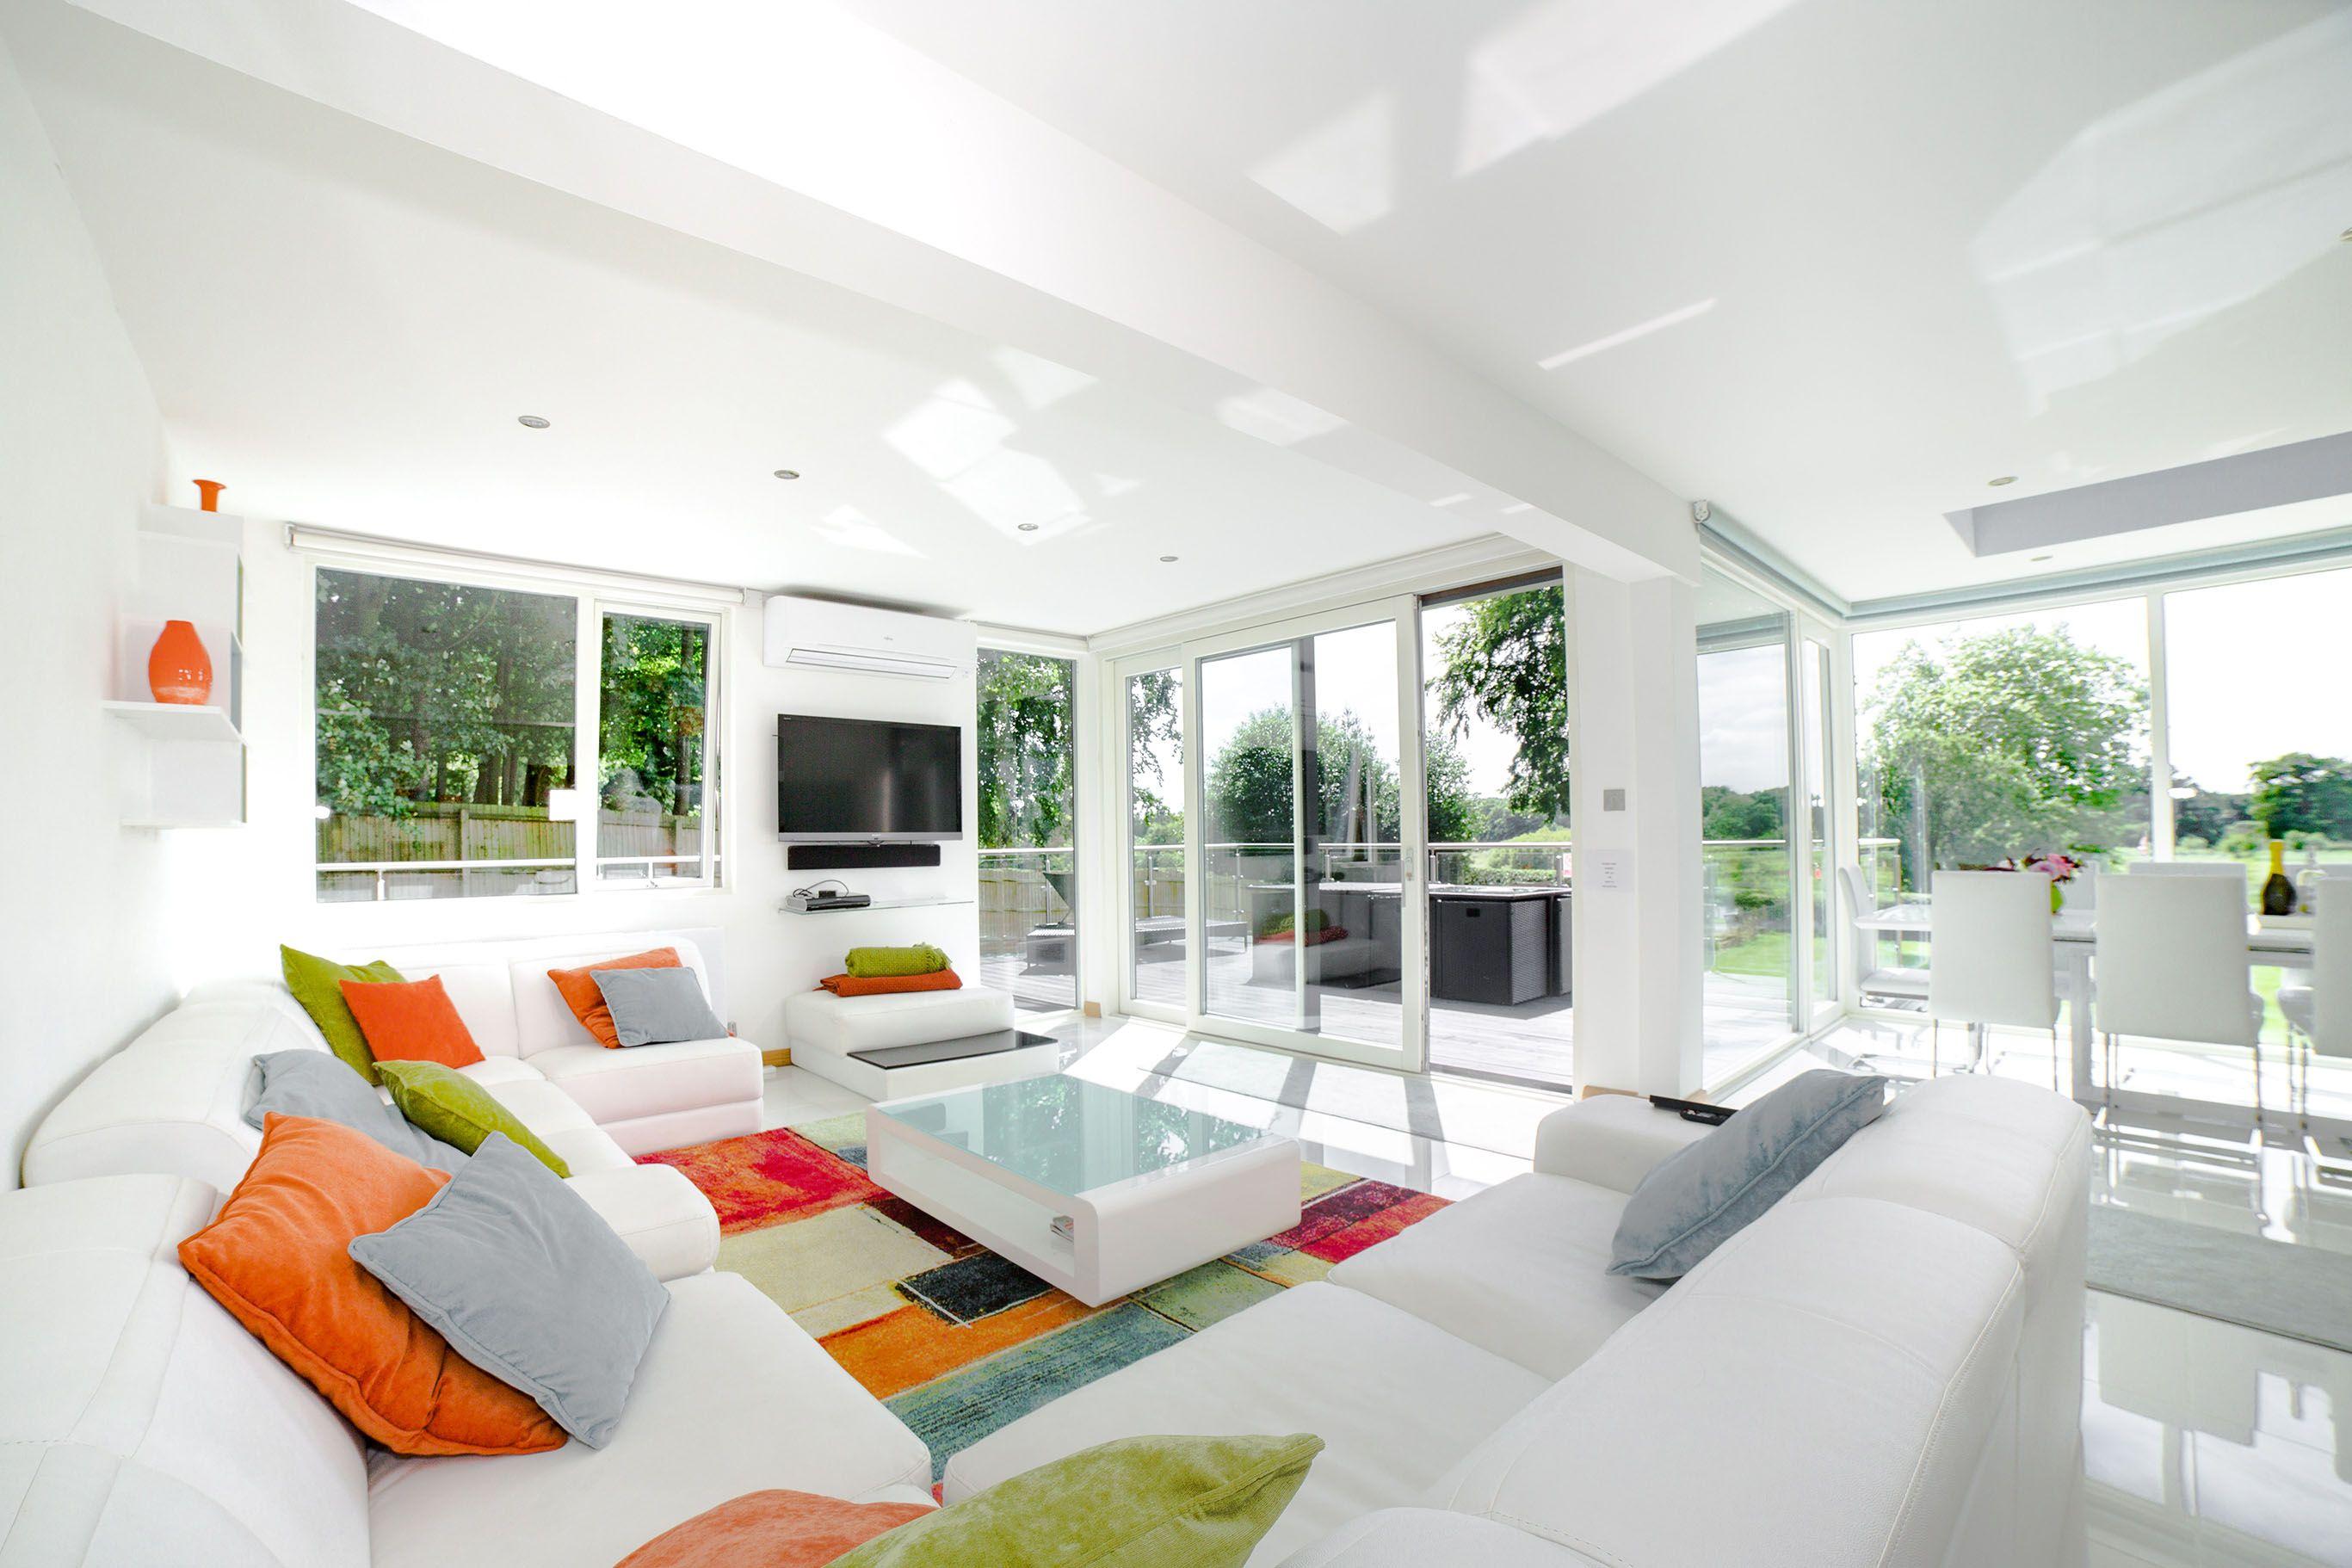 High Performance Composite Windows Composite Windows Contemporary Architecture Window Design